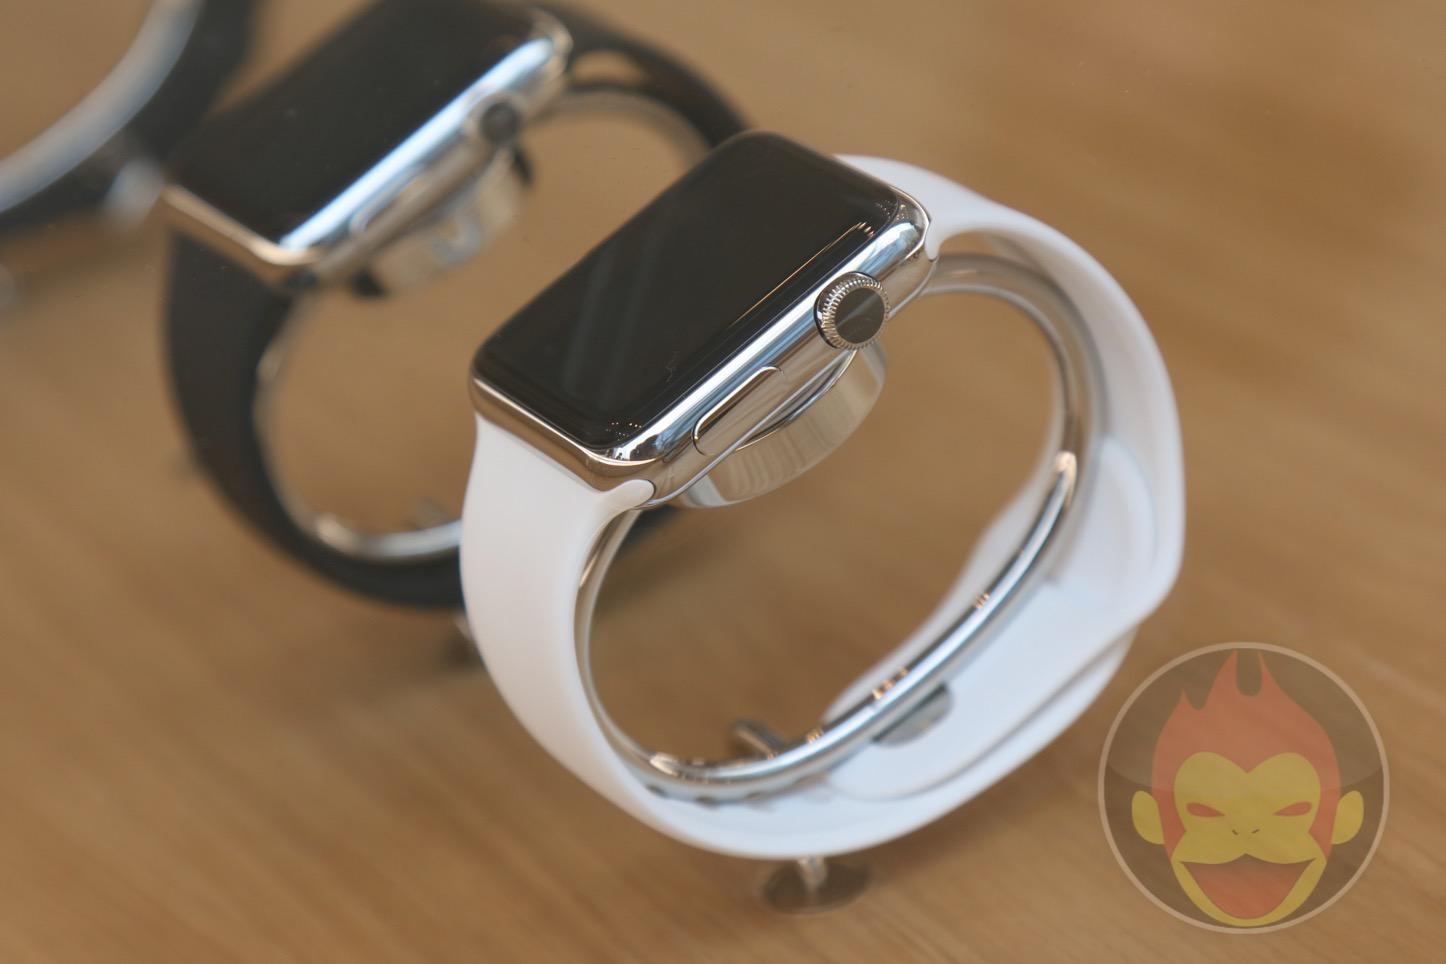 Apple-Watch-Omotesando-41.JPG